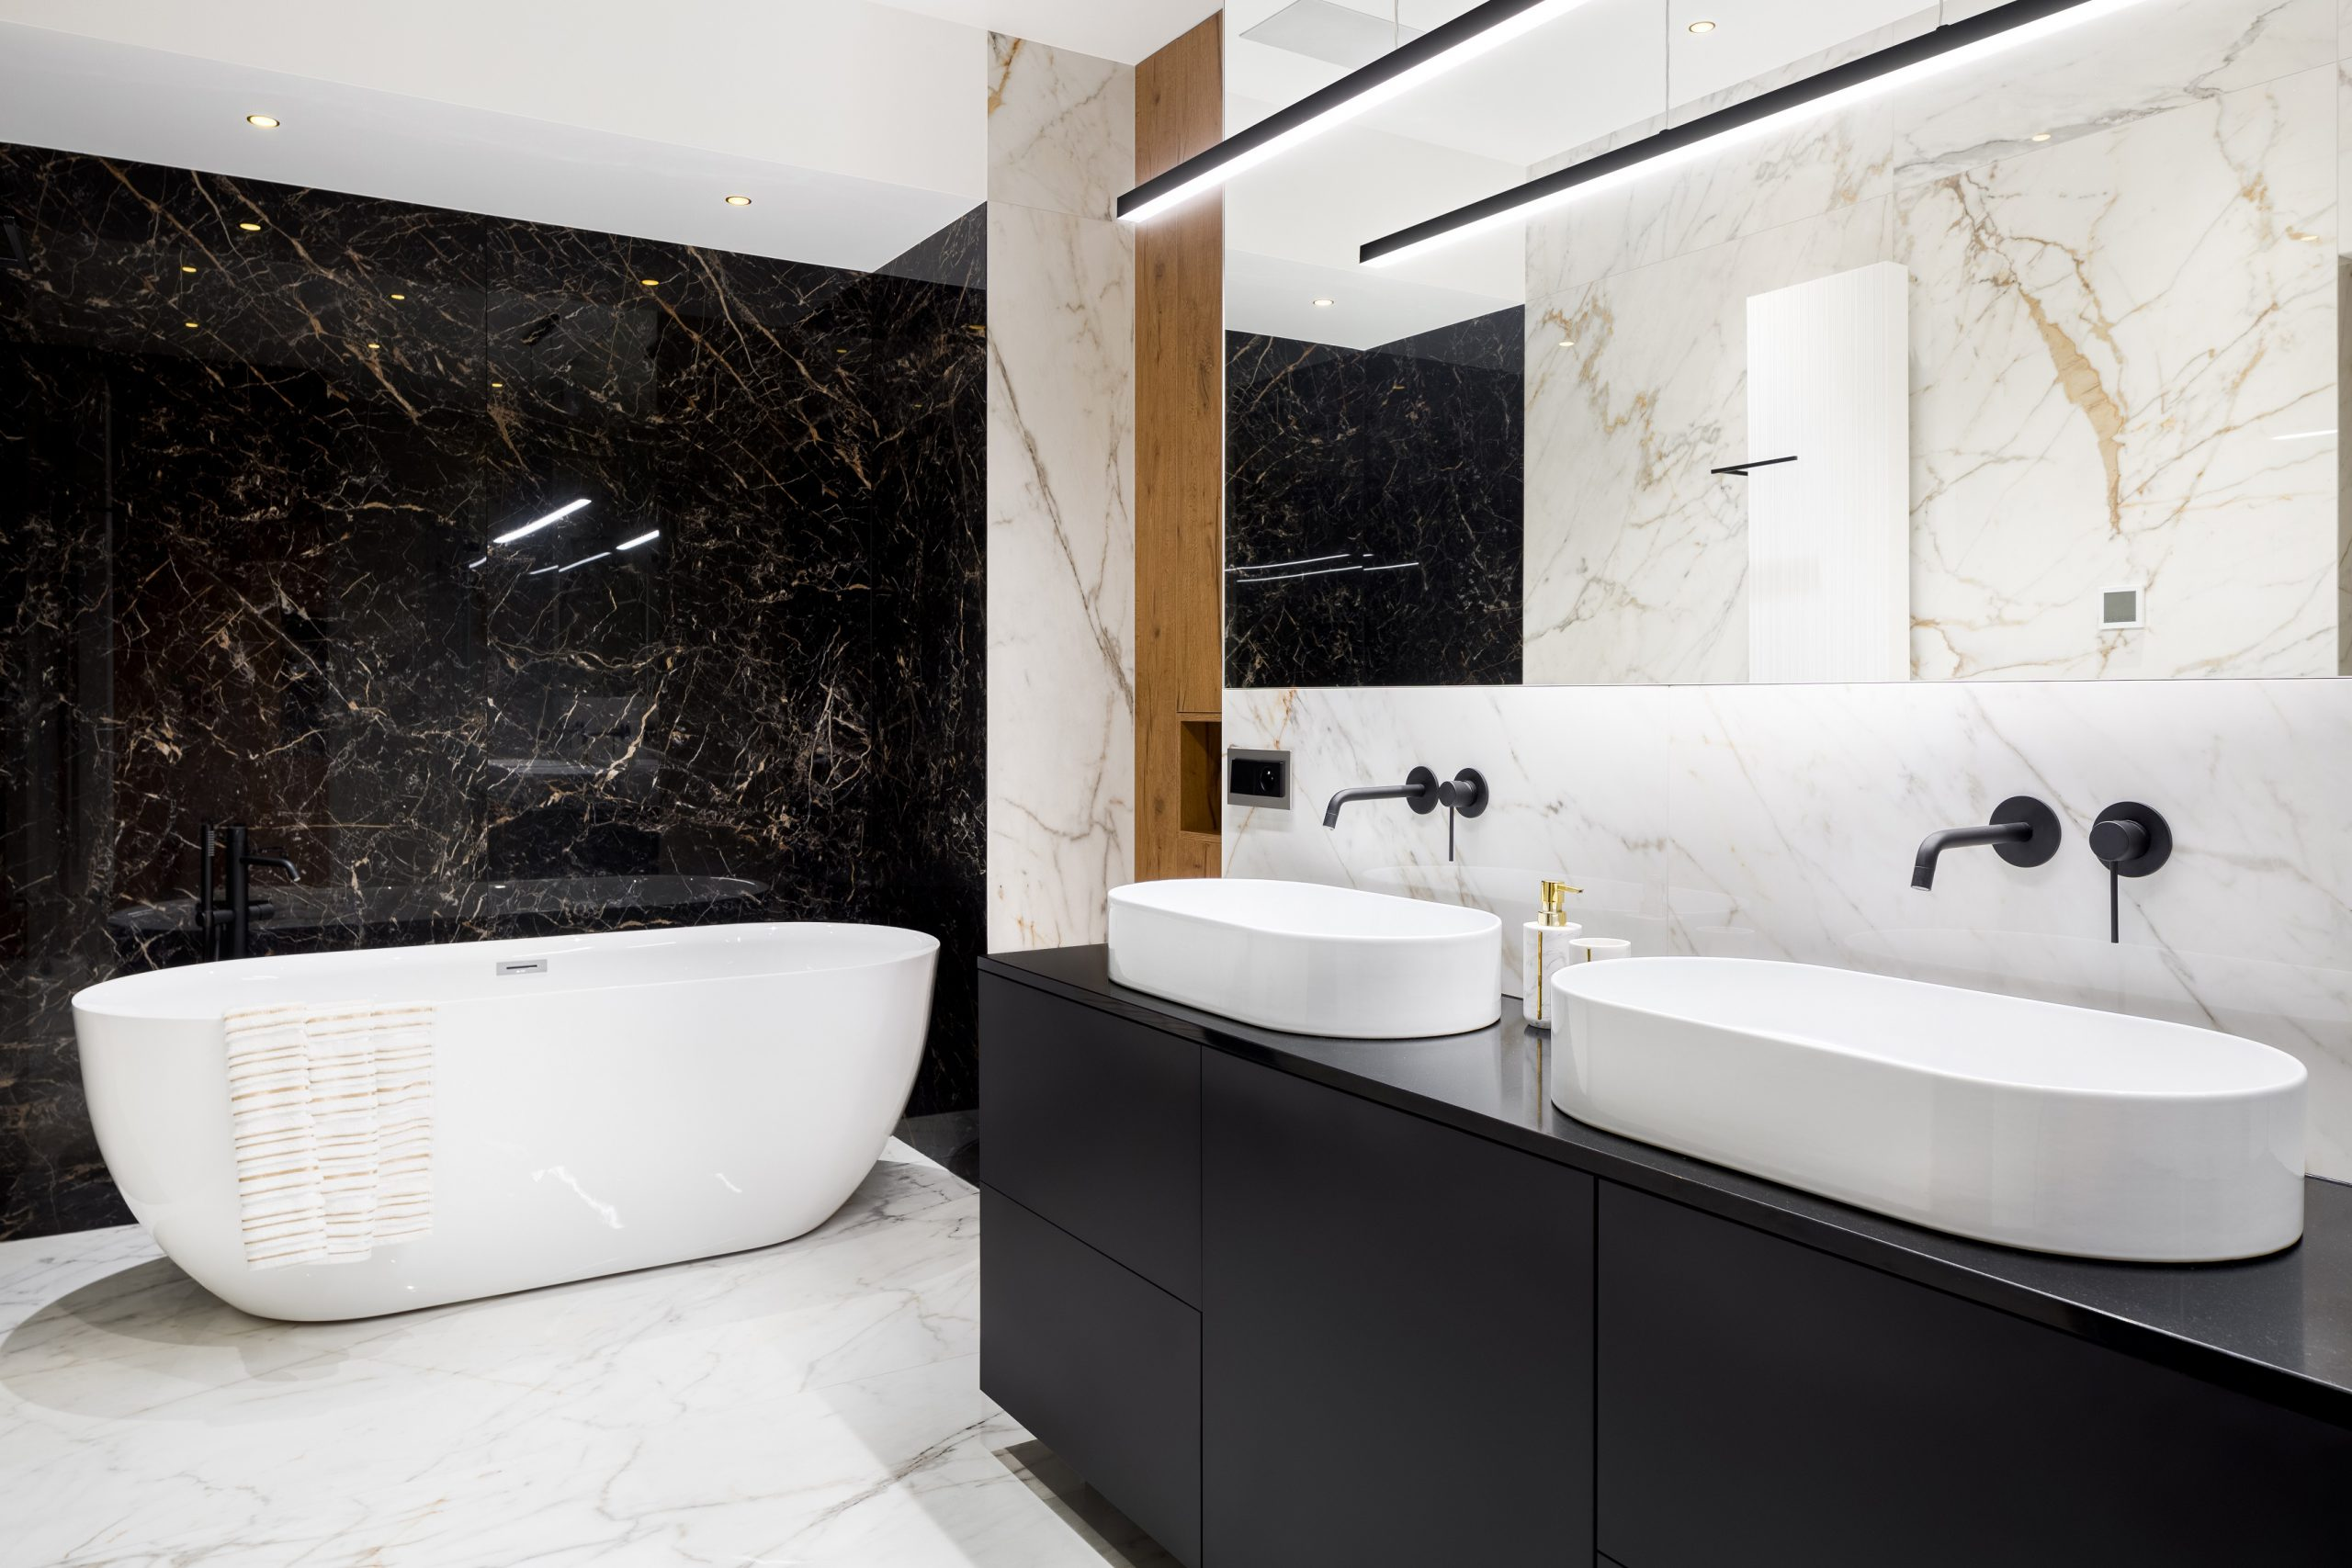 Luxury bathroom with marble tiles